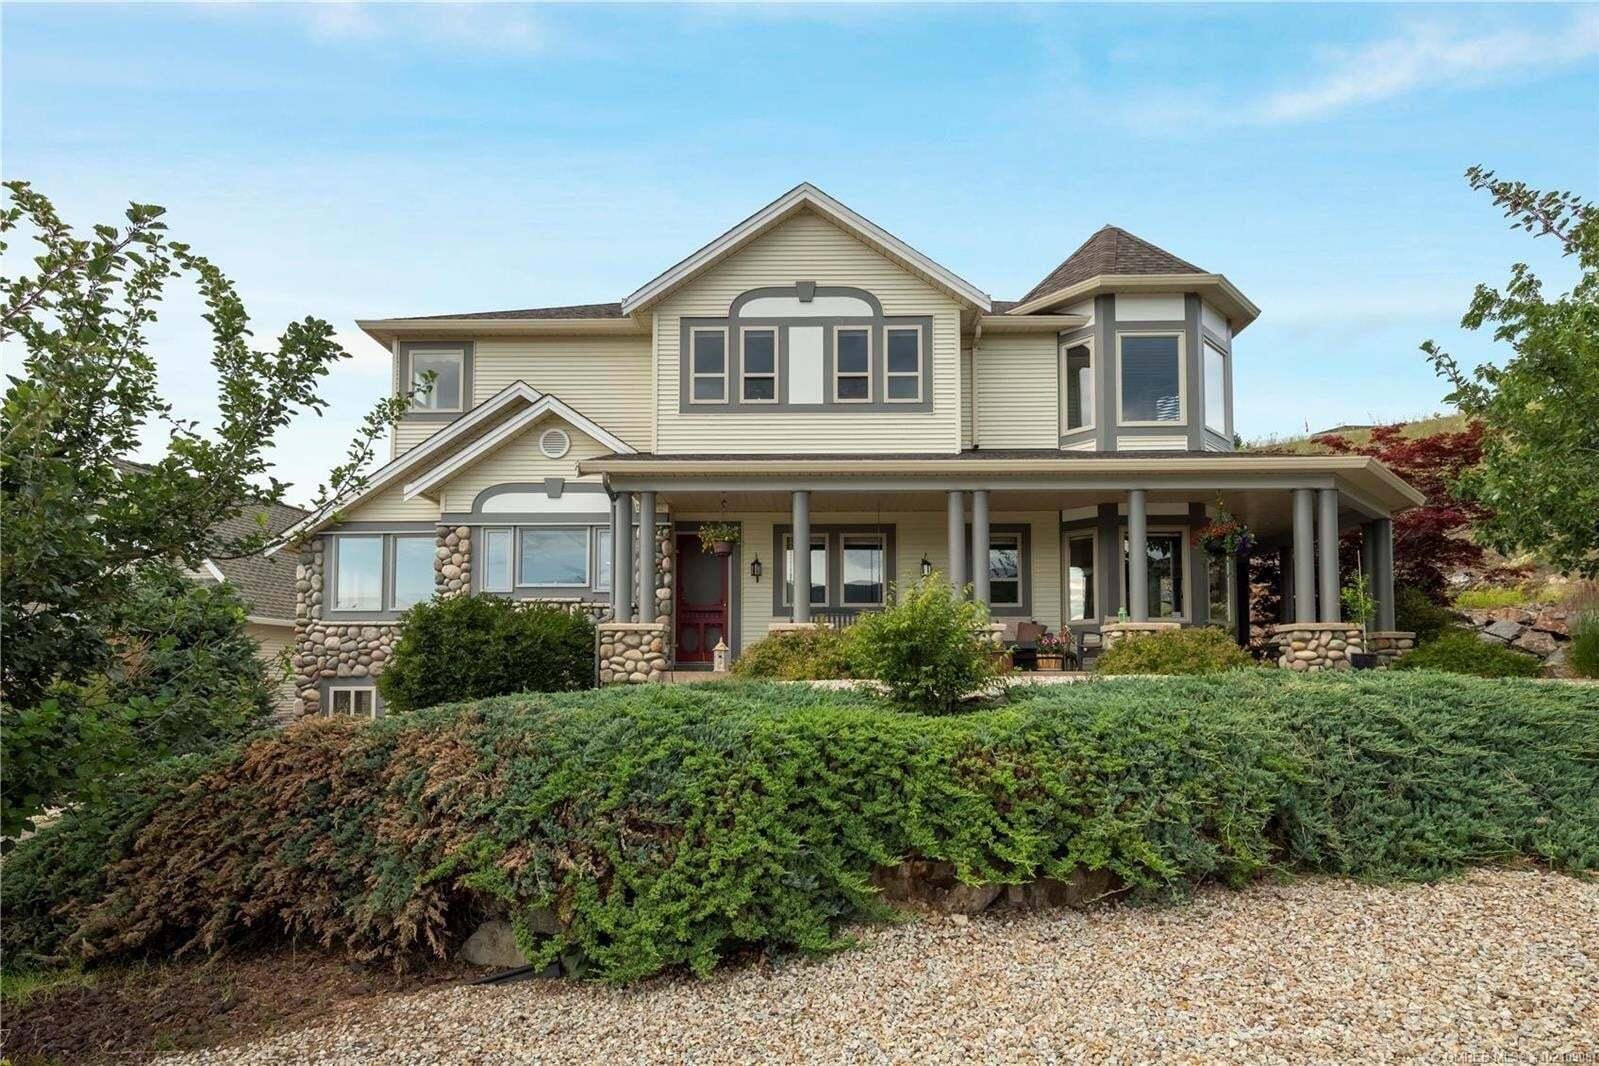 House for sale at 8886 Braeburn Dr Coldstream British Columbia - MLS: 10210908